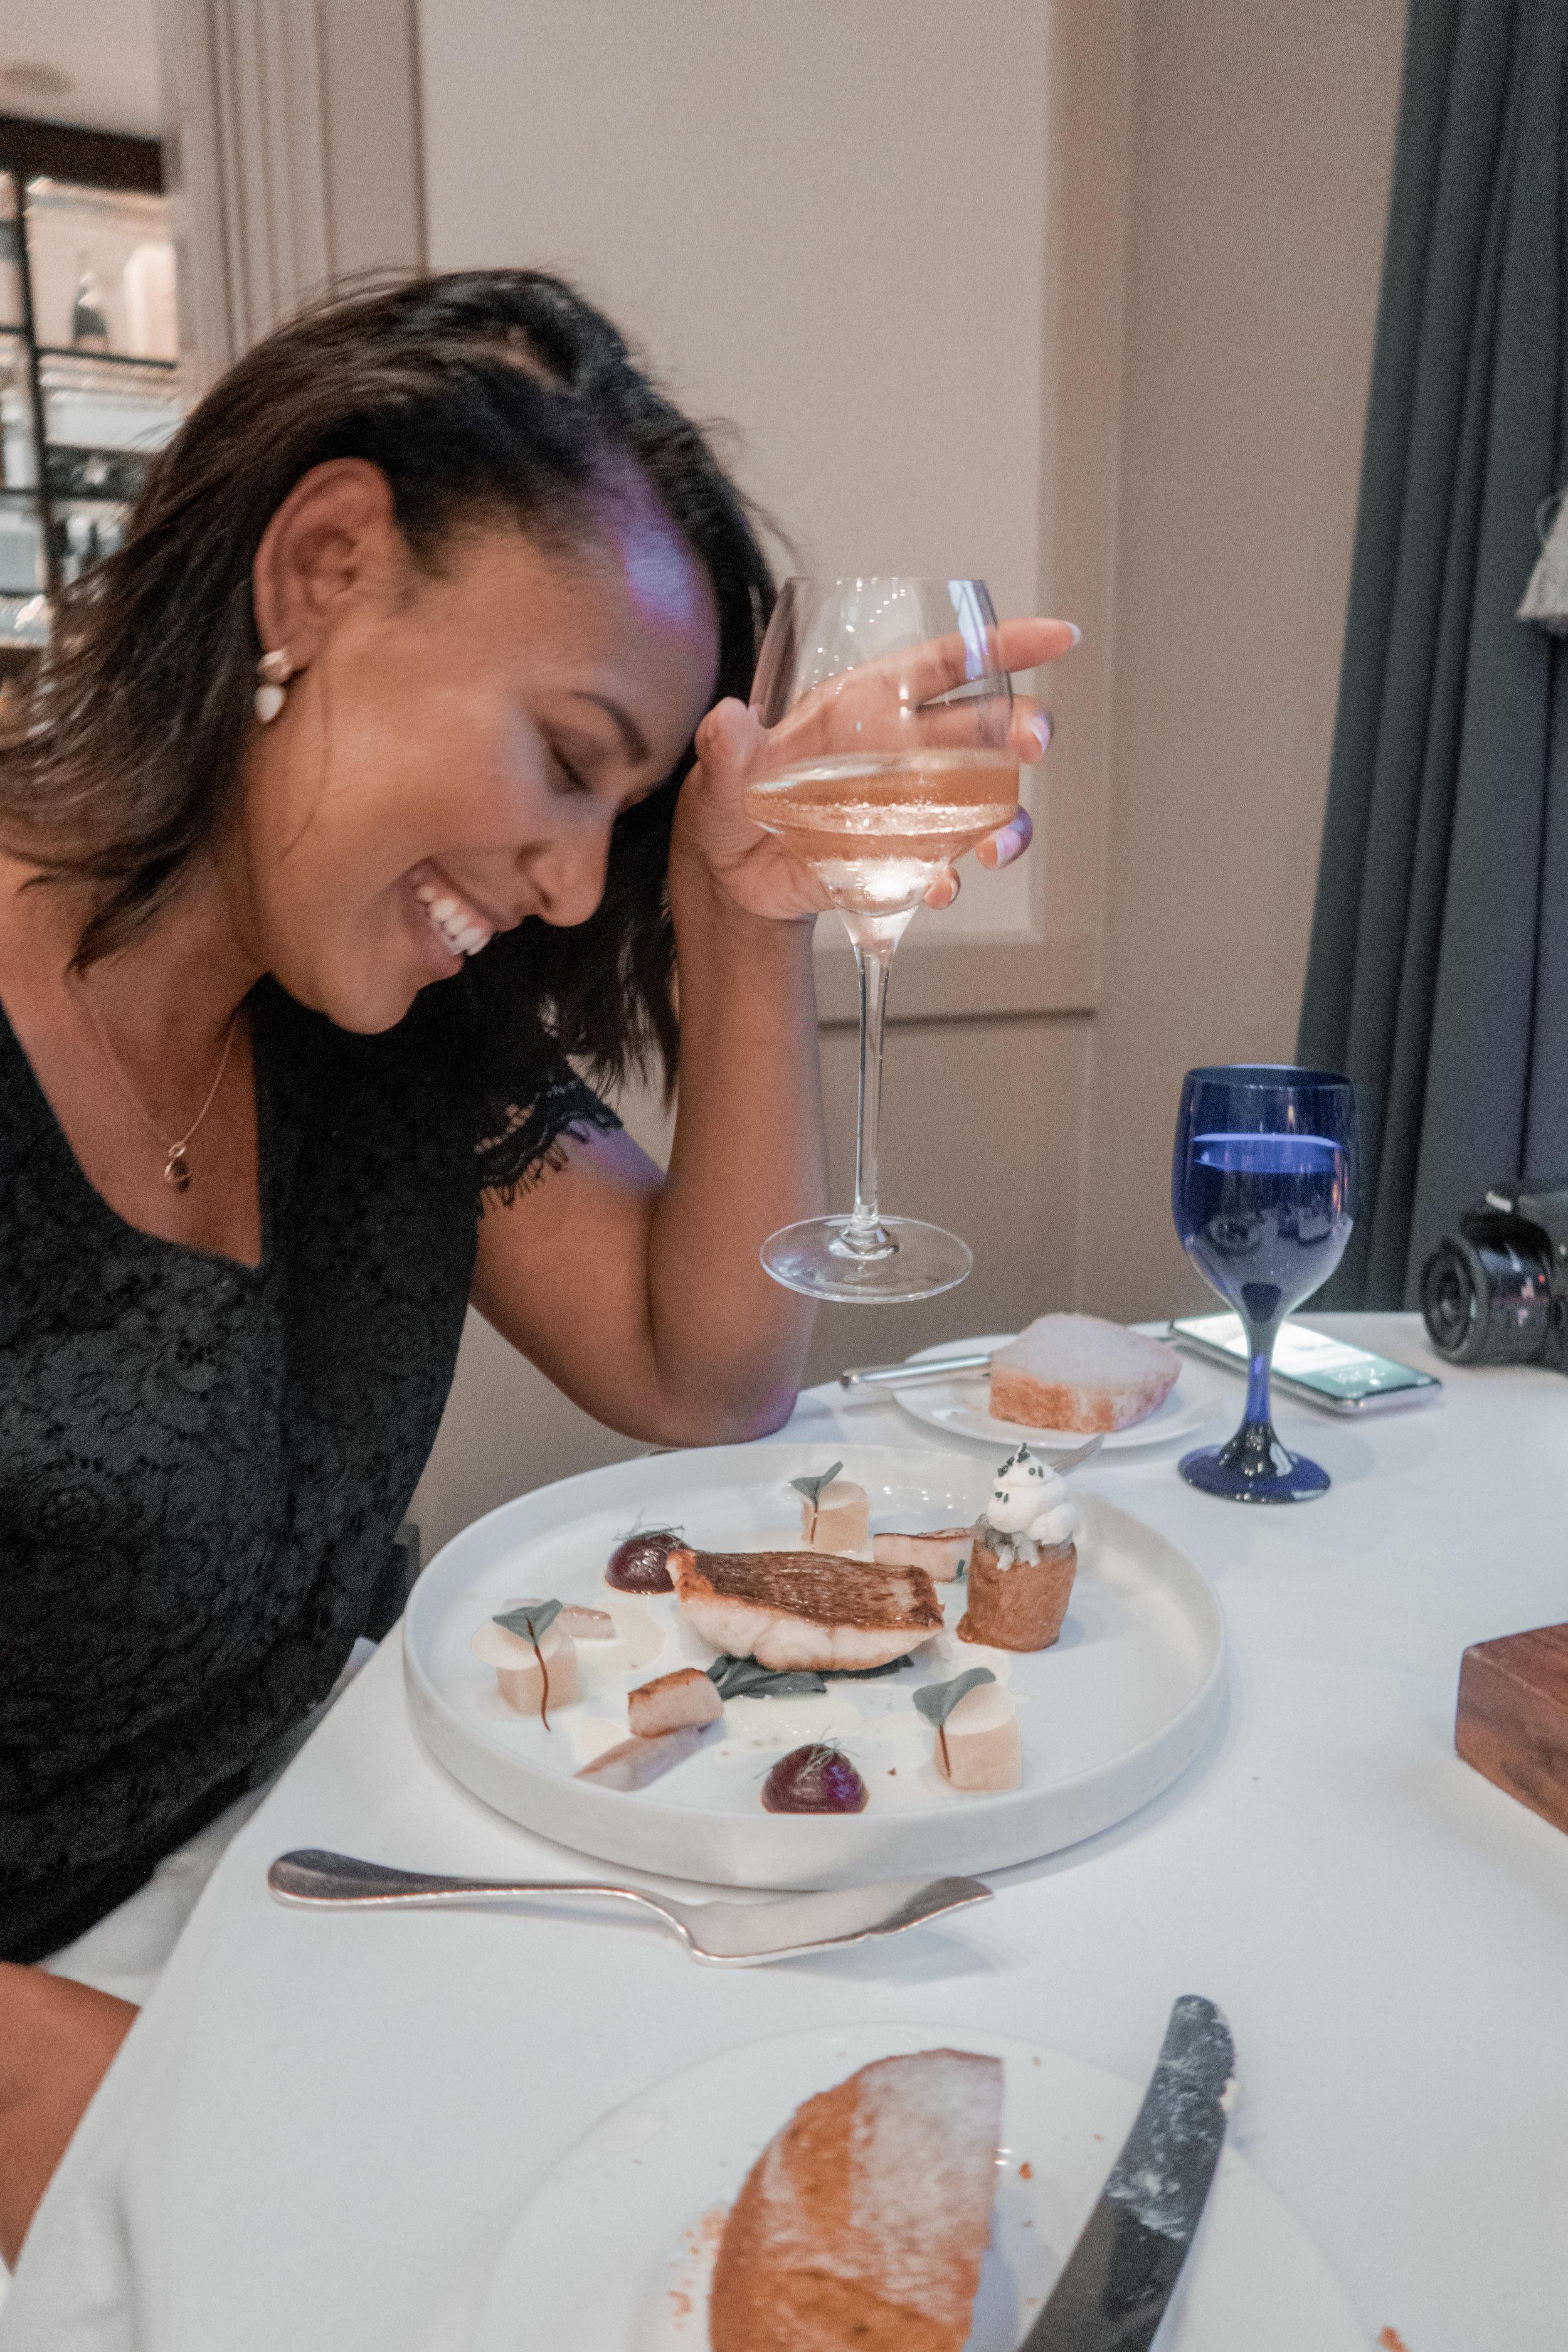 nicole fiona serrao lets eat with nicole sea bass roasted sea bass, scallops, beet root, smoked eel, hay baked potato, smoked roe cream, horseradish royal crescent hotel and spa